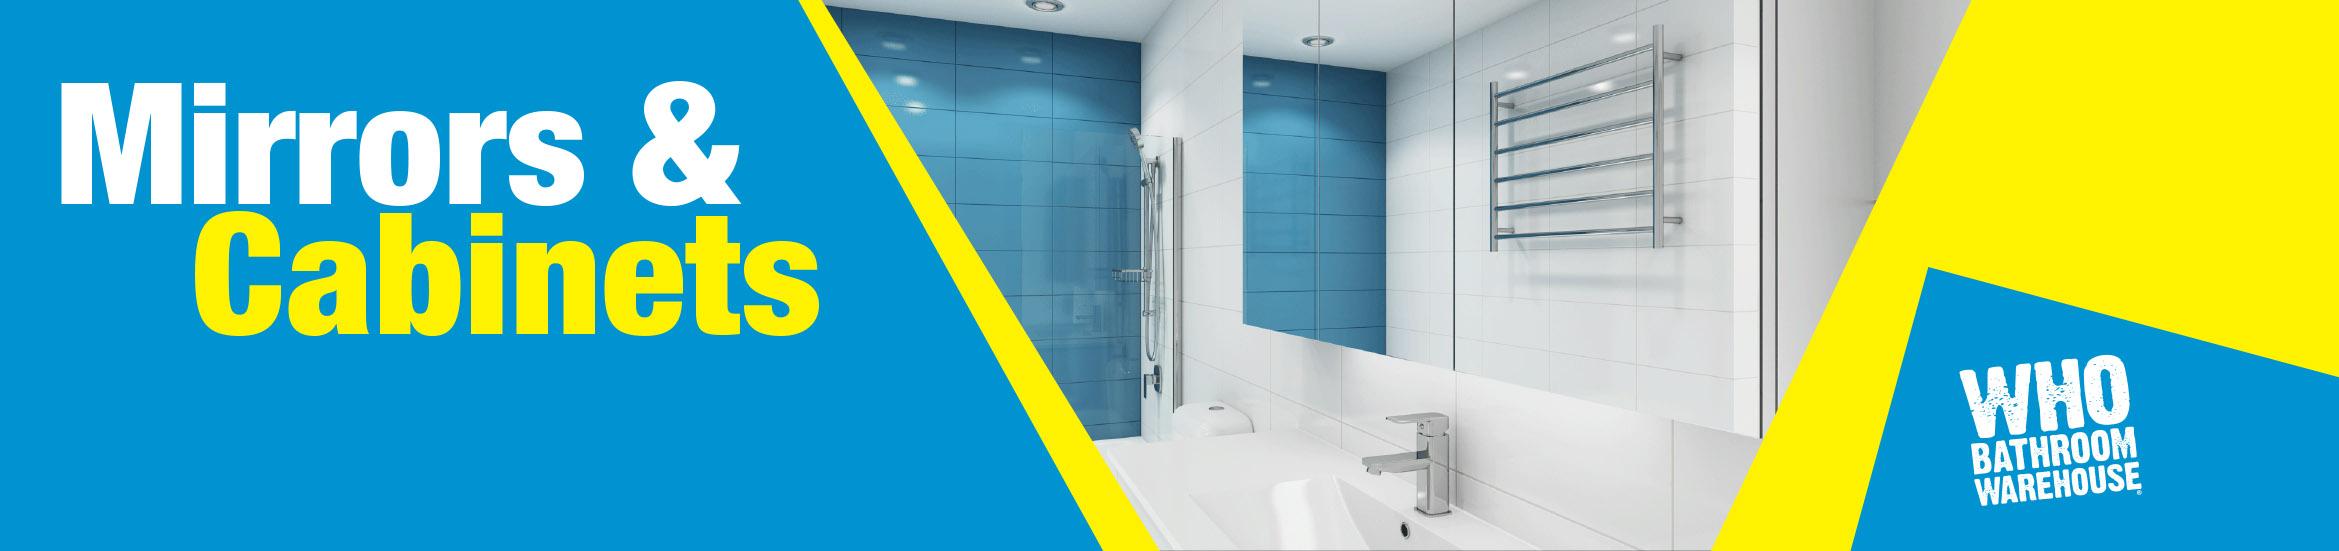 mc-image-mirrors-cabinets.jpg